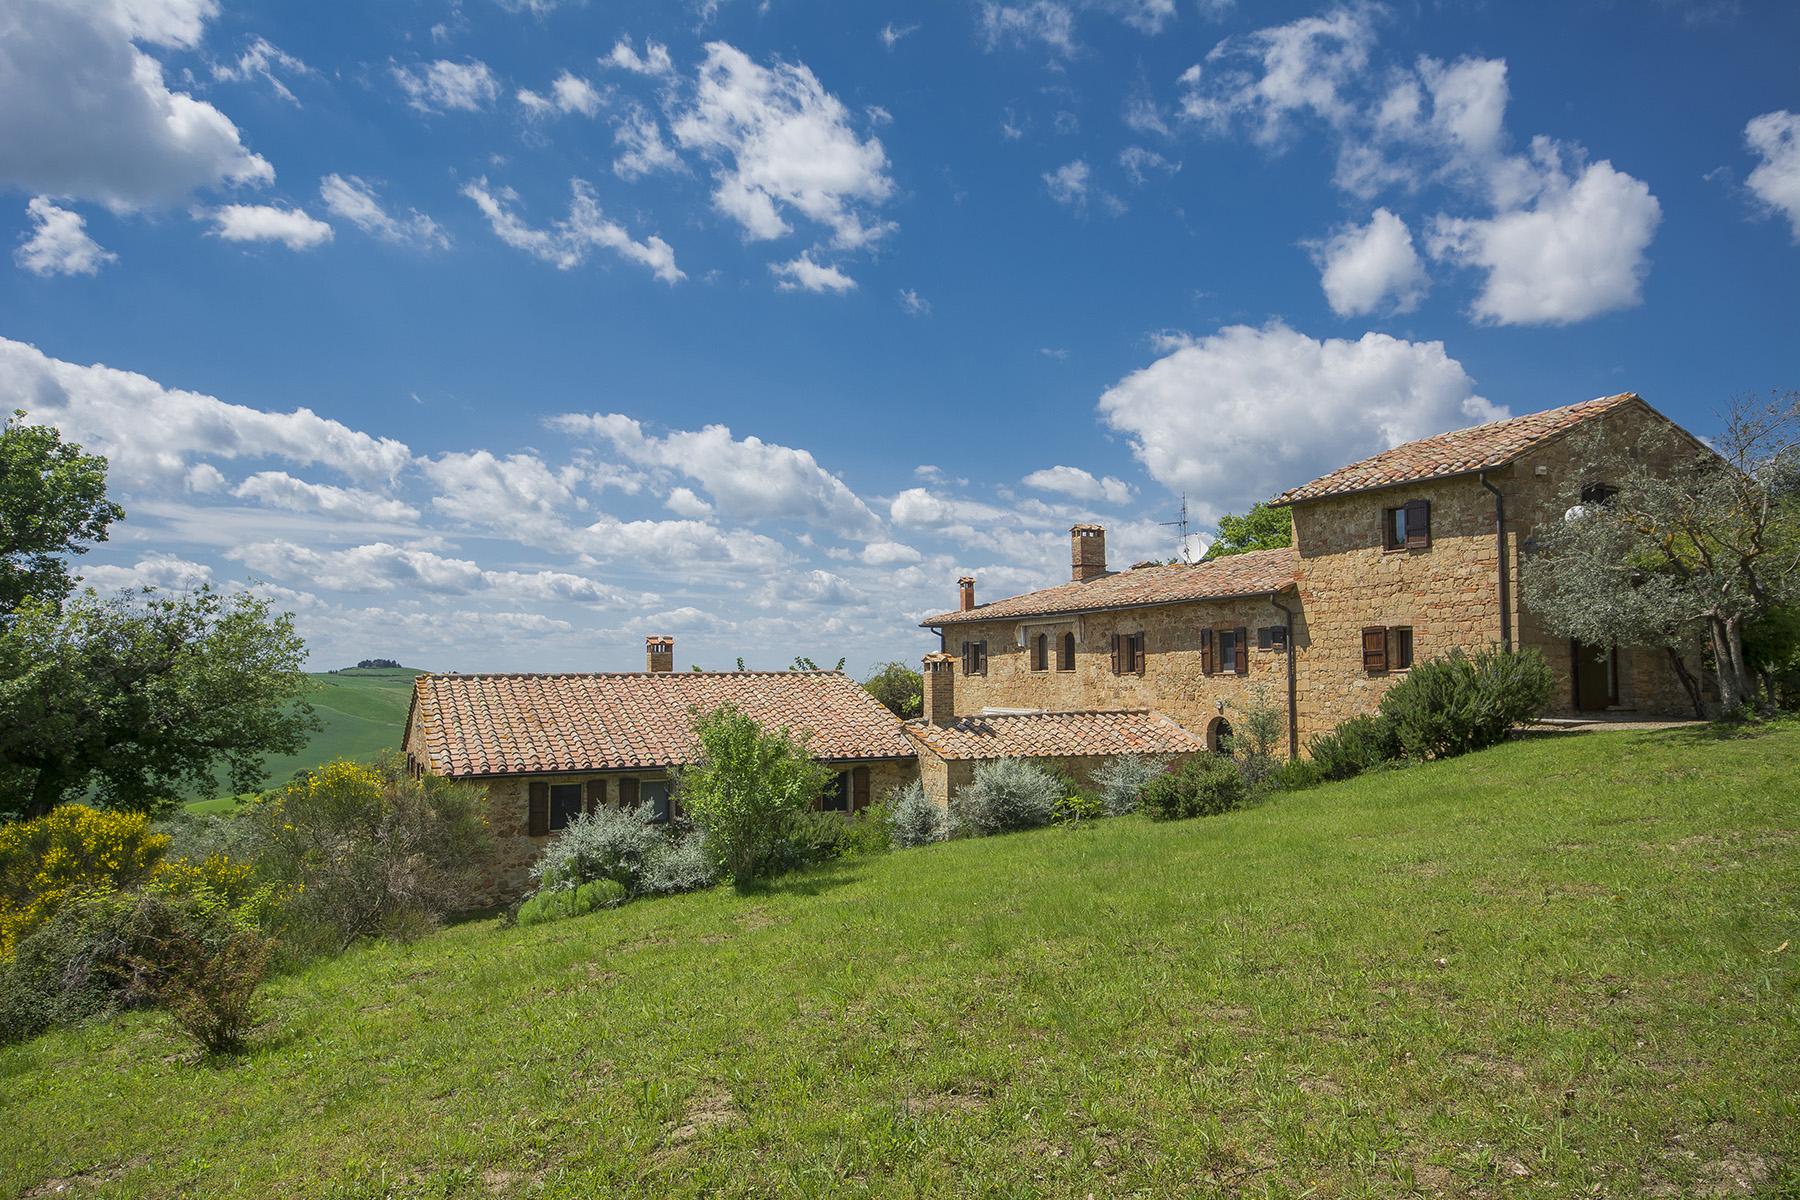 Casa indipendente in Vendita a Pienza: 5 locali, 400 mq